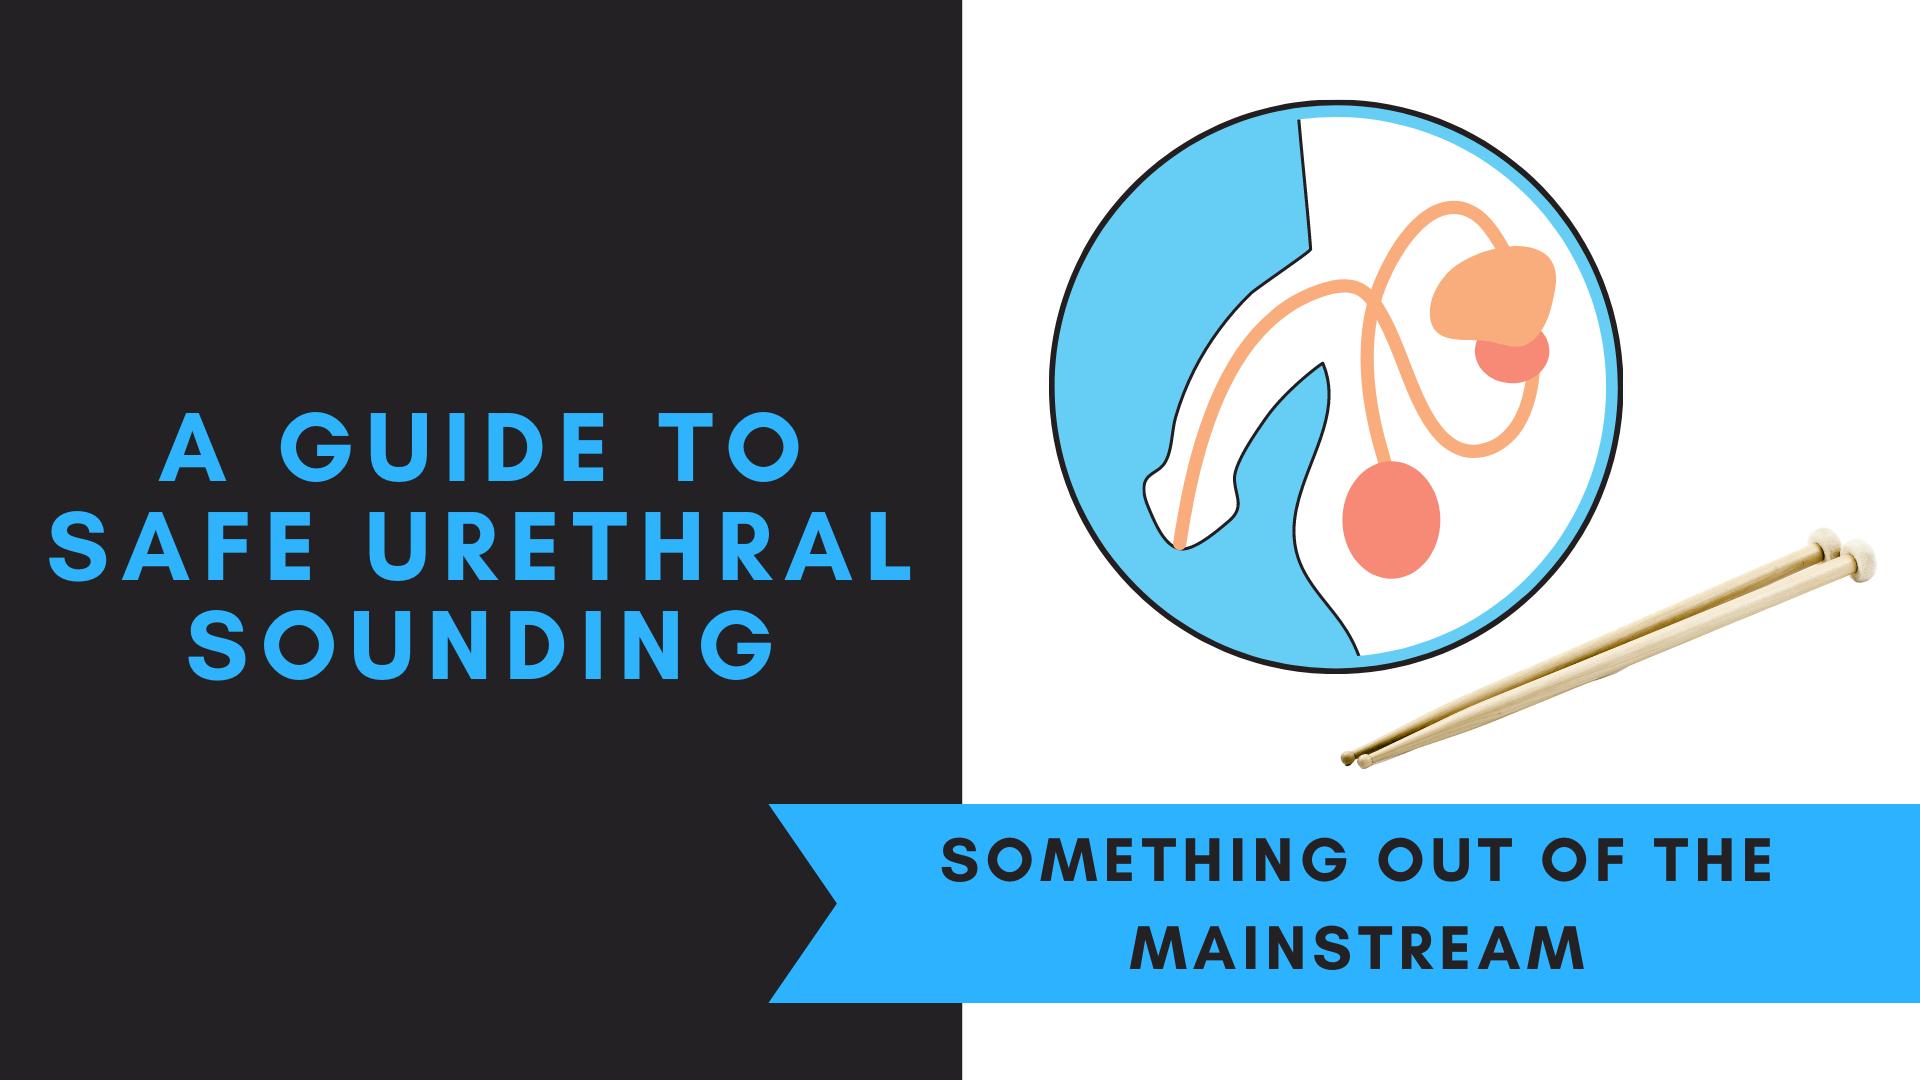 A Guide to Safe Urethral Sounding